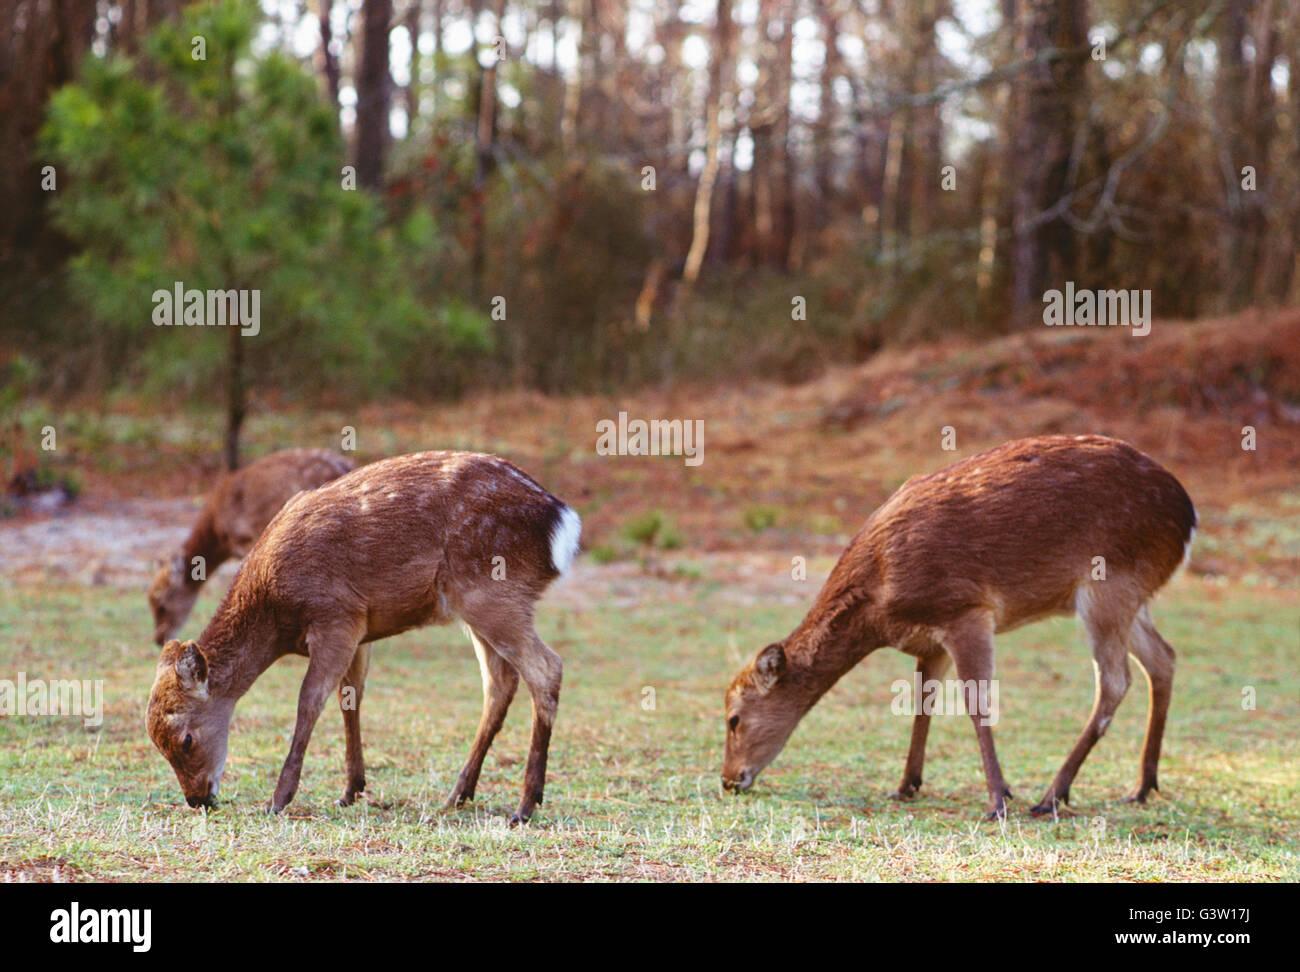 Sika cervo (Cervus Nippon); Chincoteague National Wildlife Refuge, Assateague Island, Virginia, Stati Uniti d'America Immagini Stock